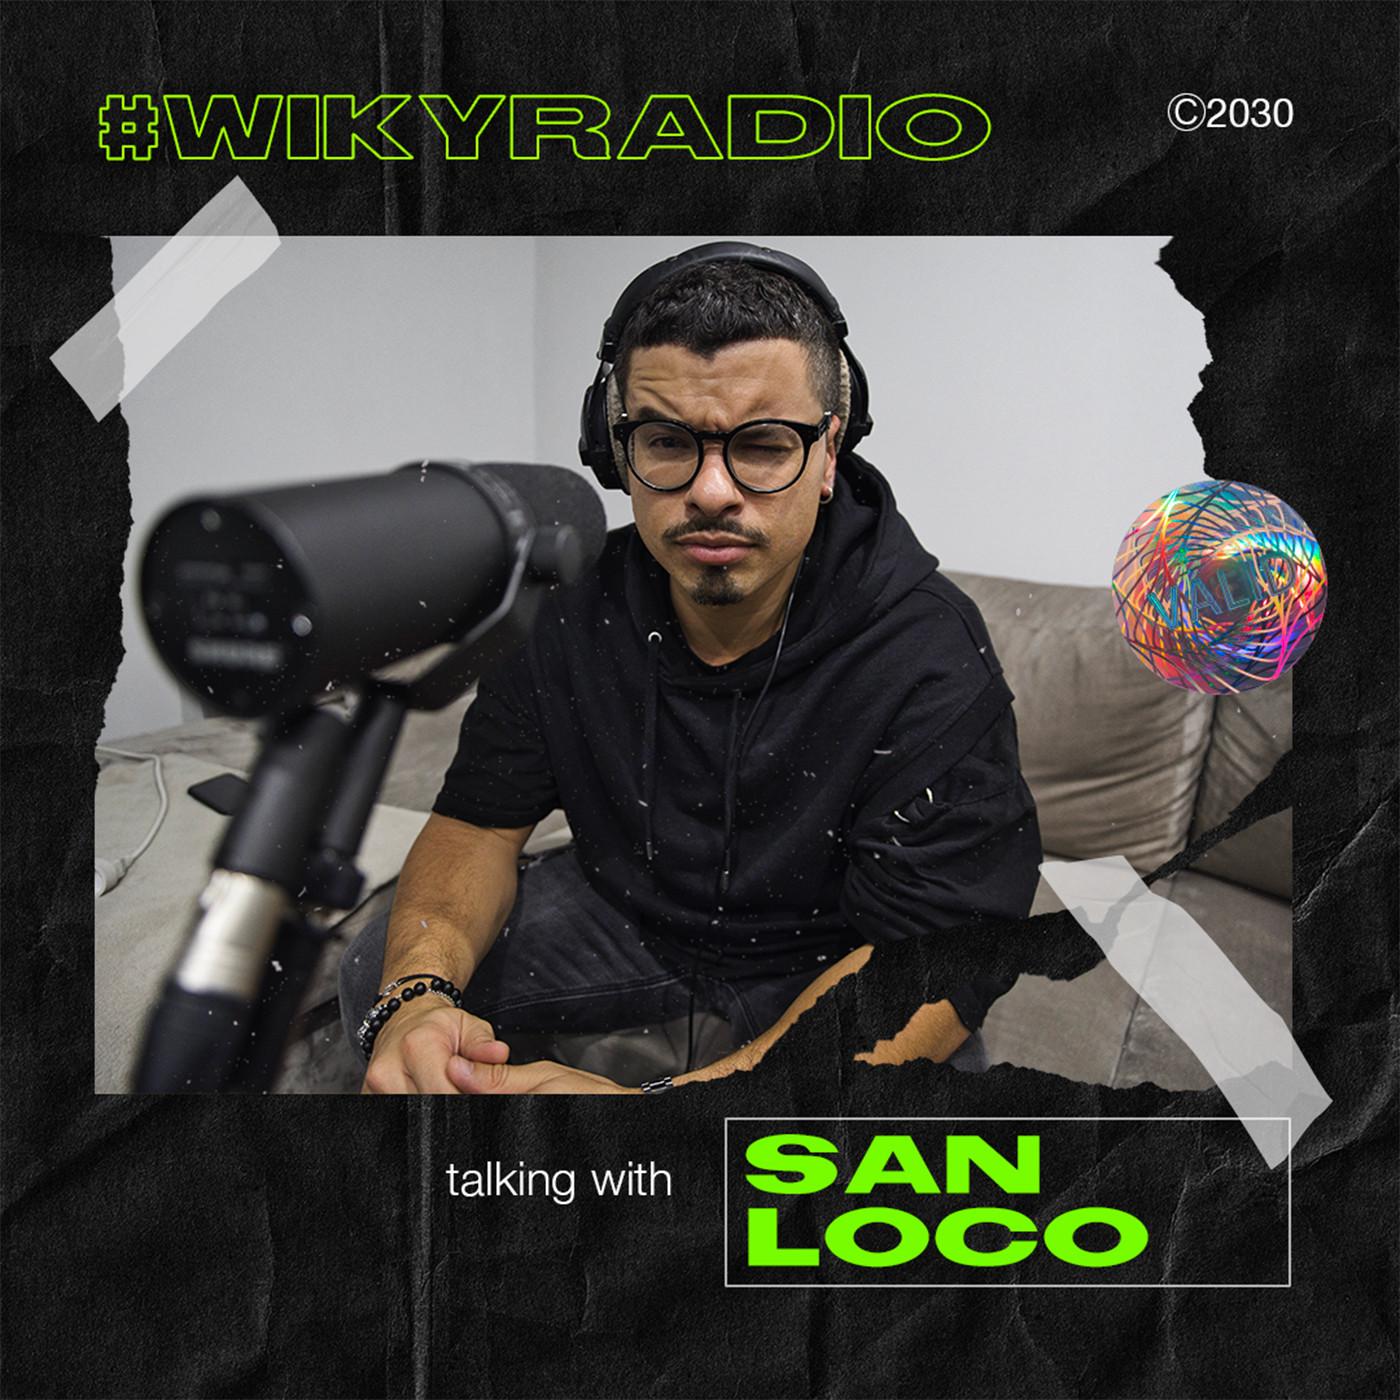 WIKY RADIO - TALKING WITH SAN LOCO